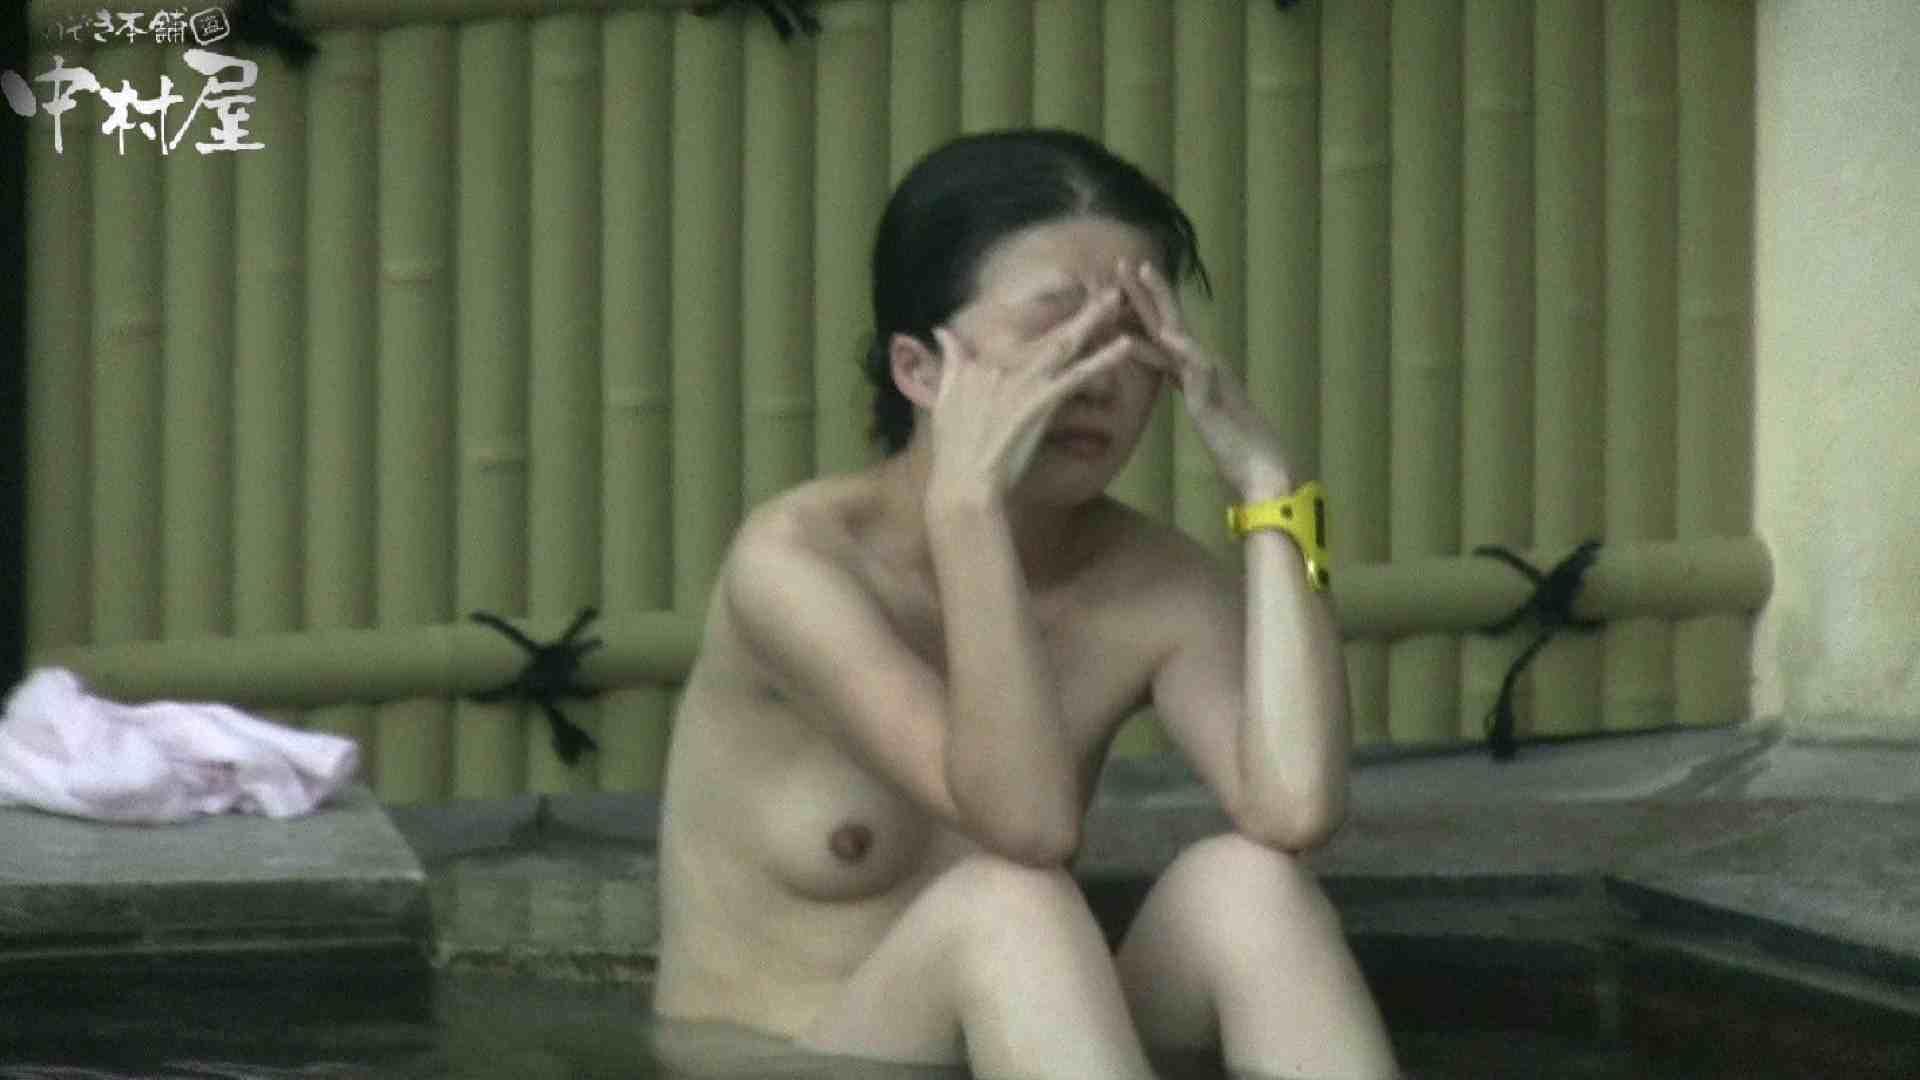 Aquaな露天風呂Vol.904 盗撮師作品  103pic 66